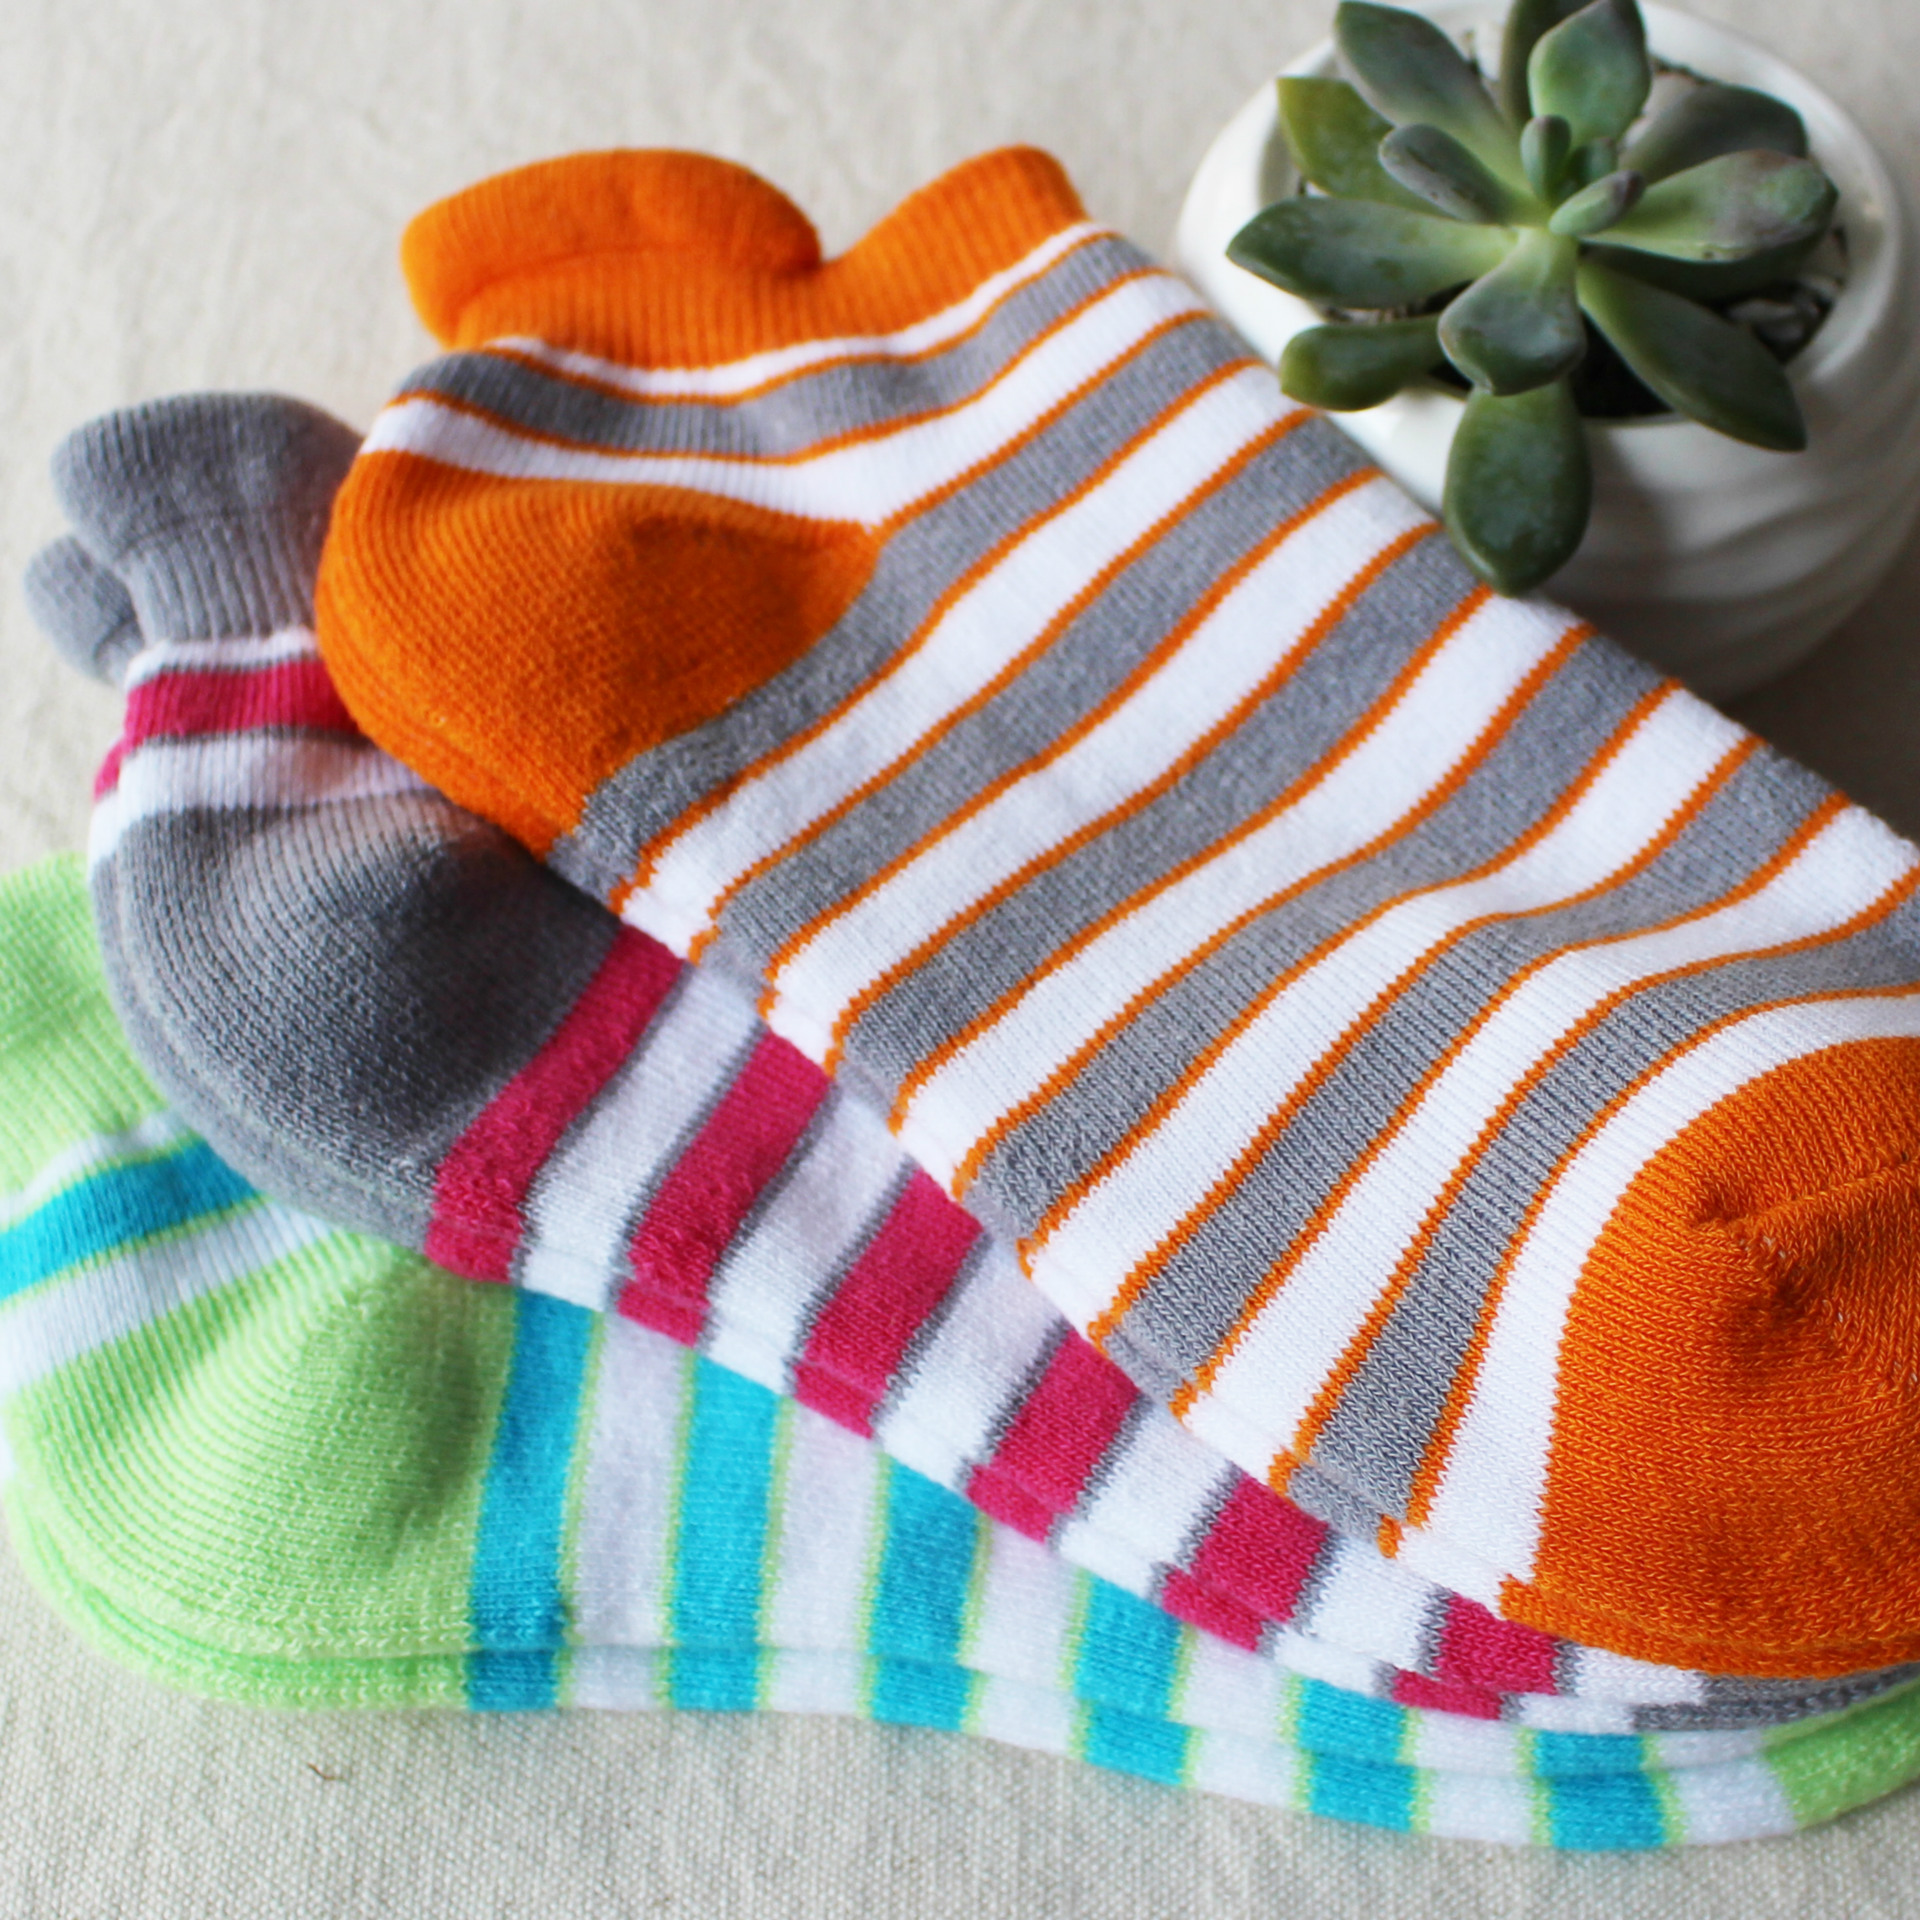 simple style Brand Creative short sock Cute Striped Cotton Socks Female Spring Autumn Fashion unisex Adult low cut ped sock 2017